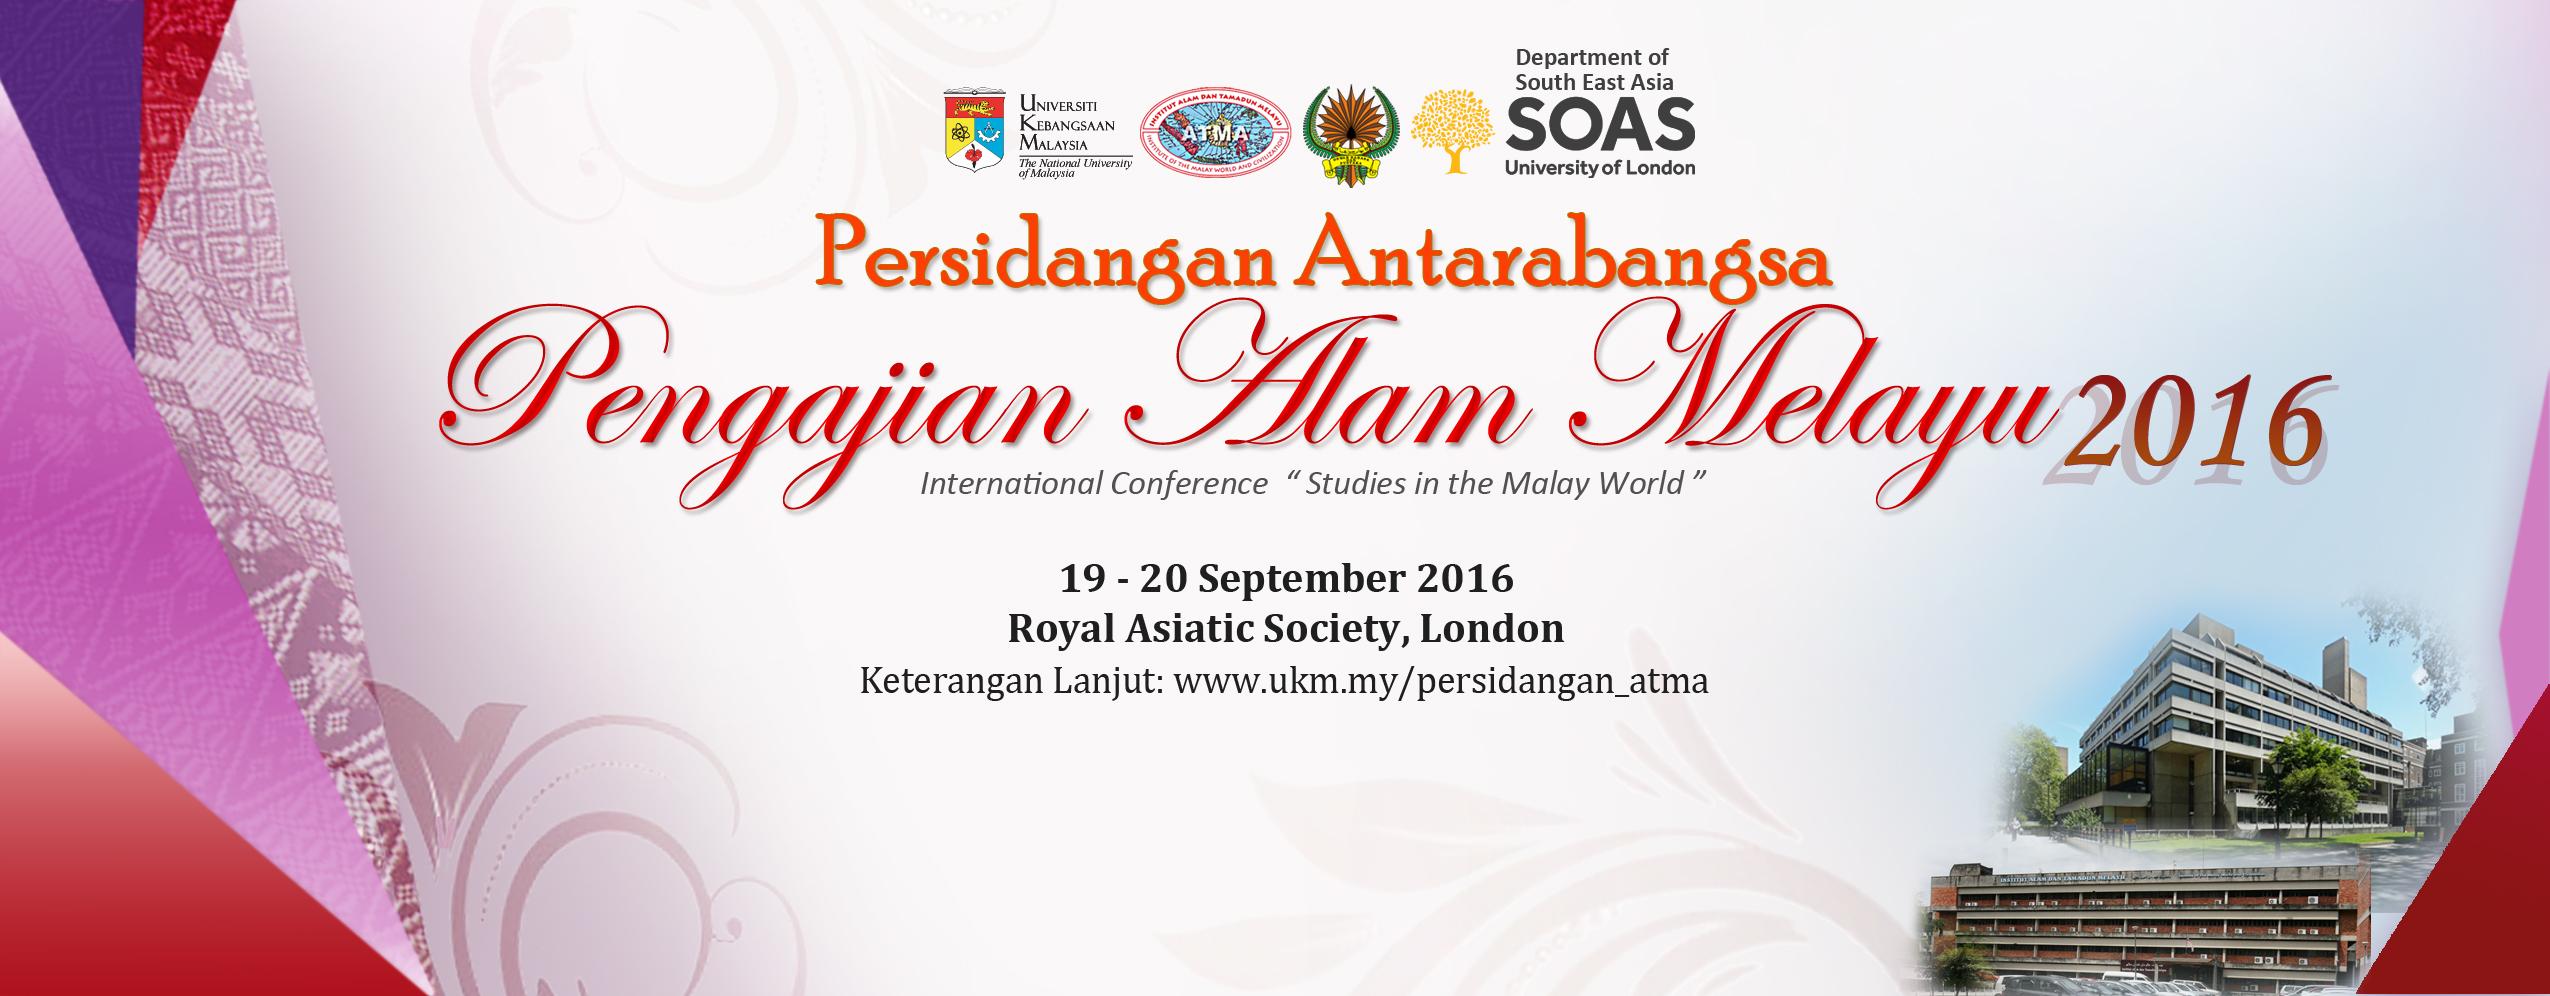 Persidangan Antarabangsa Pengajian Alam Melayu 2016